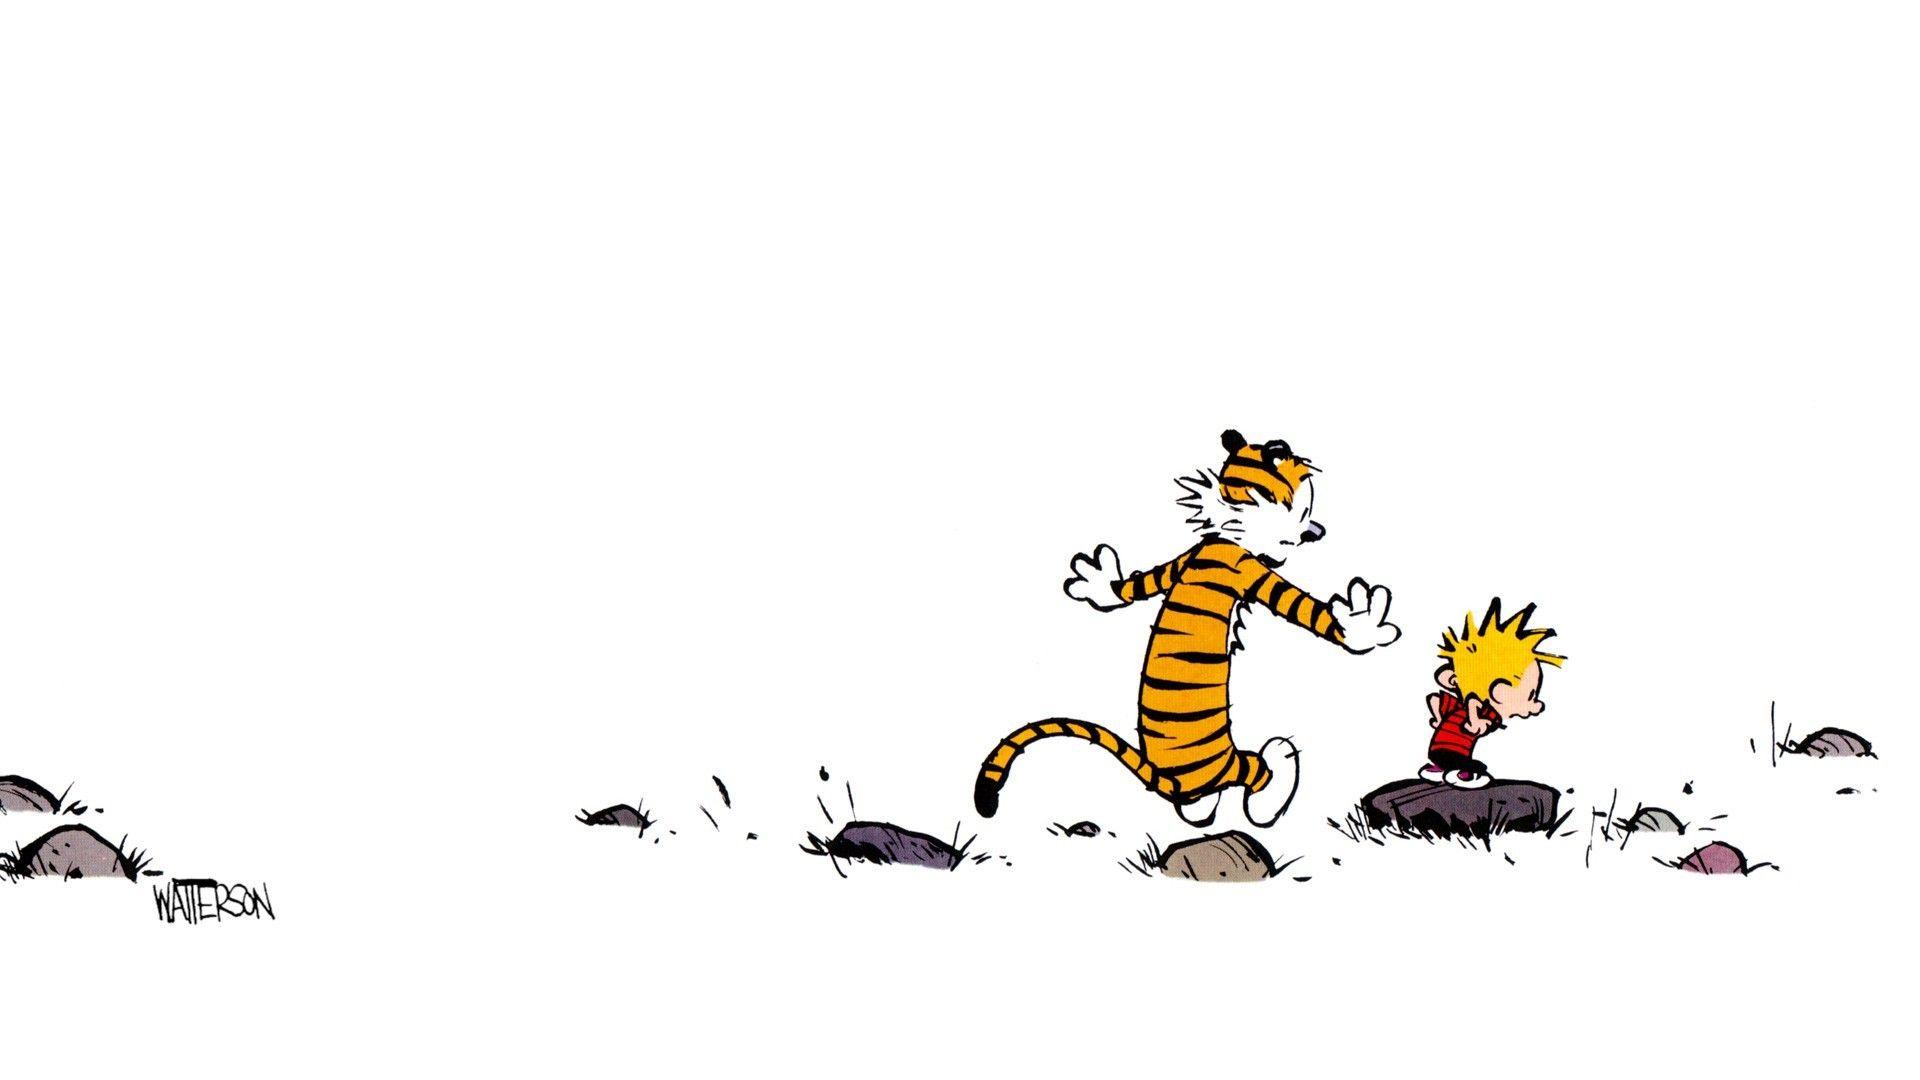 Calvin And Hobbes 2710576 1920x1080 Jpg 1 920 1 080 Pixels